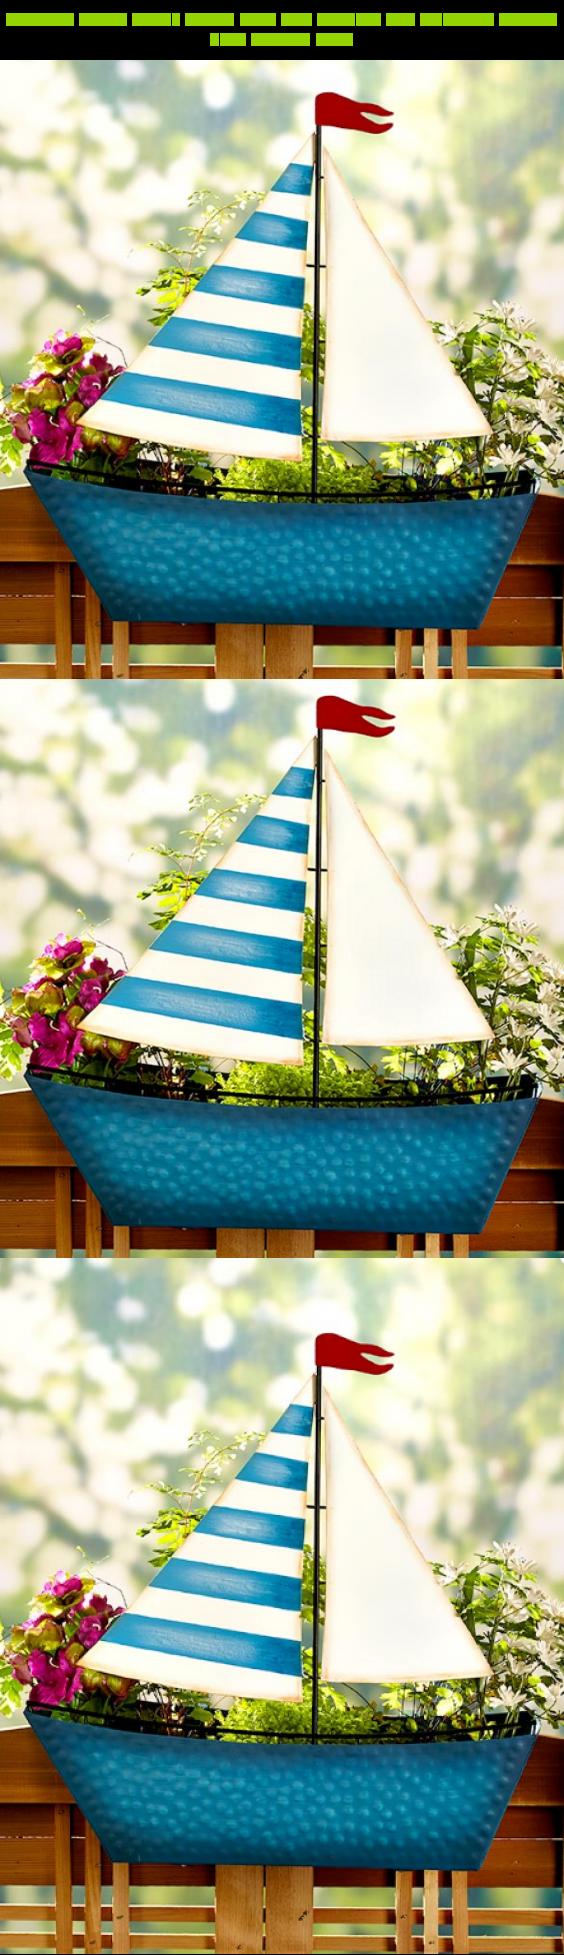 Sailboat decor front porch deck rail planter box outdoor flower herb